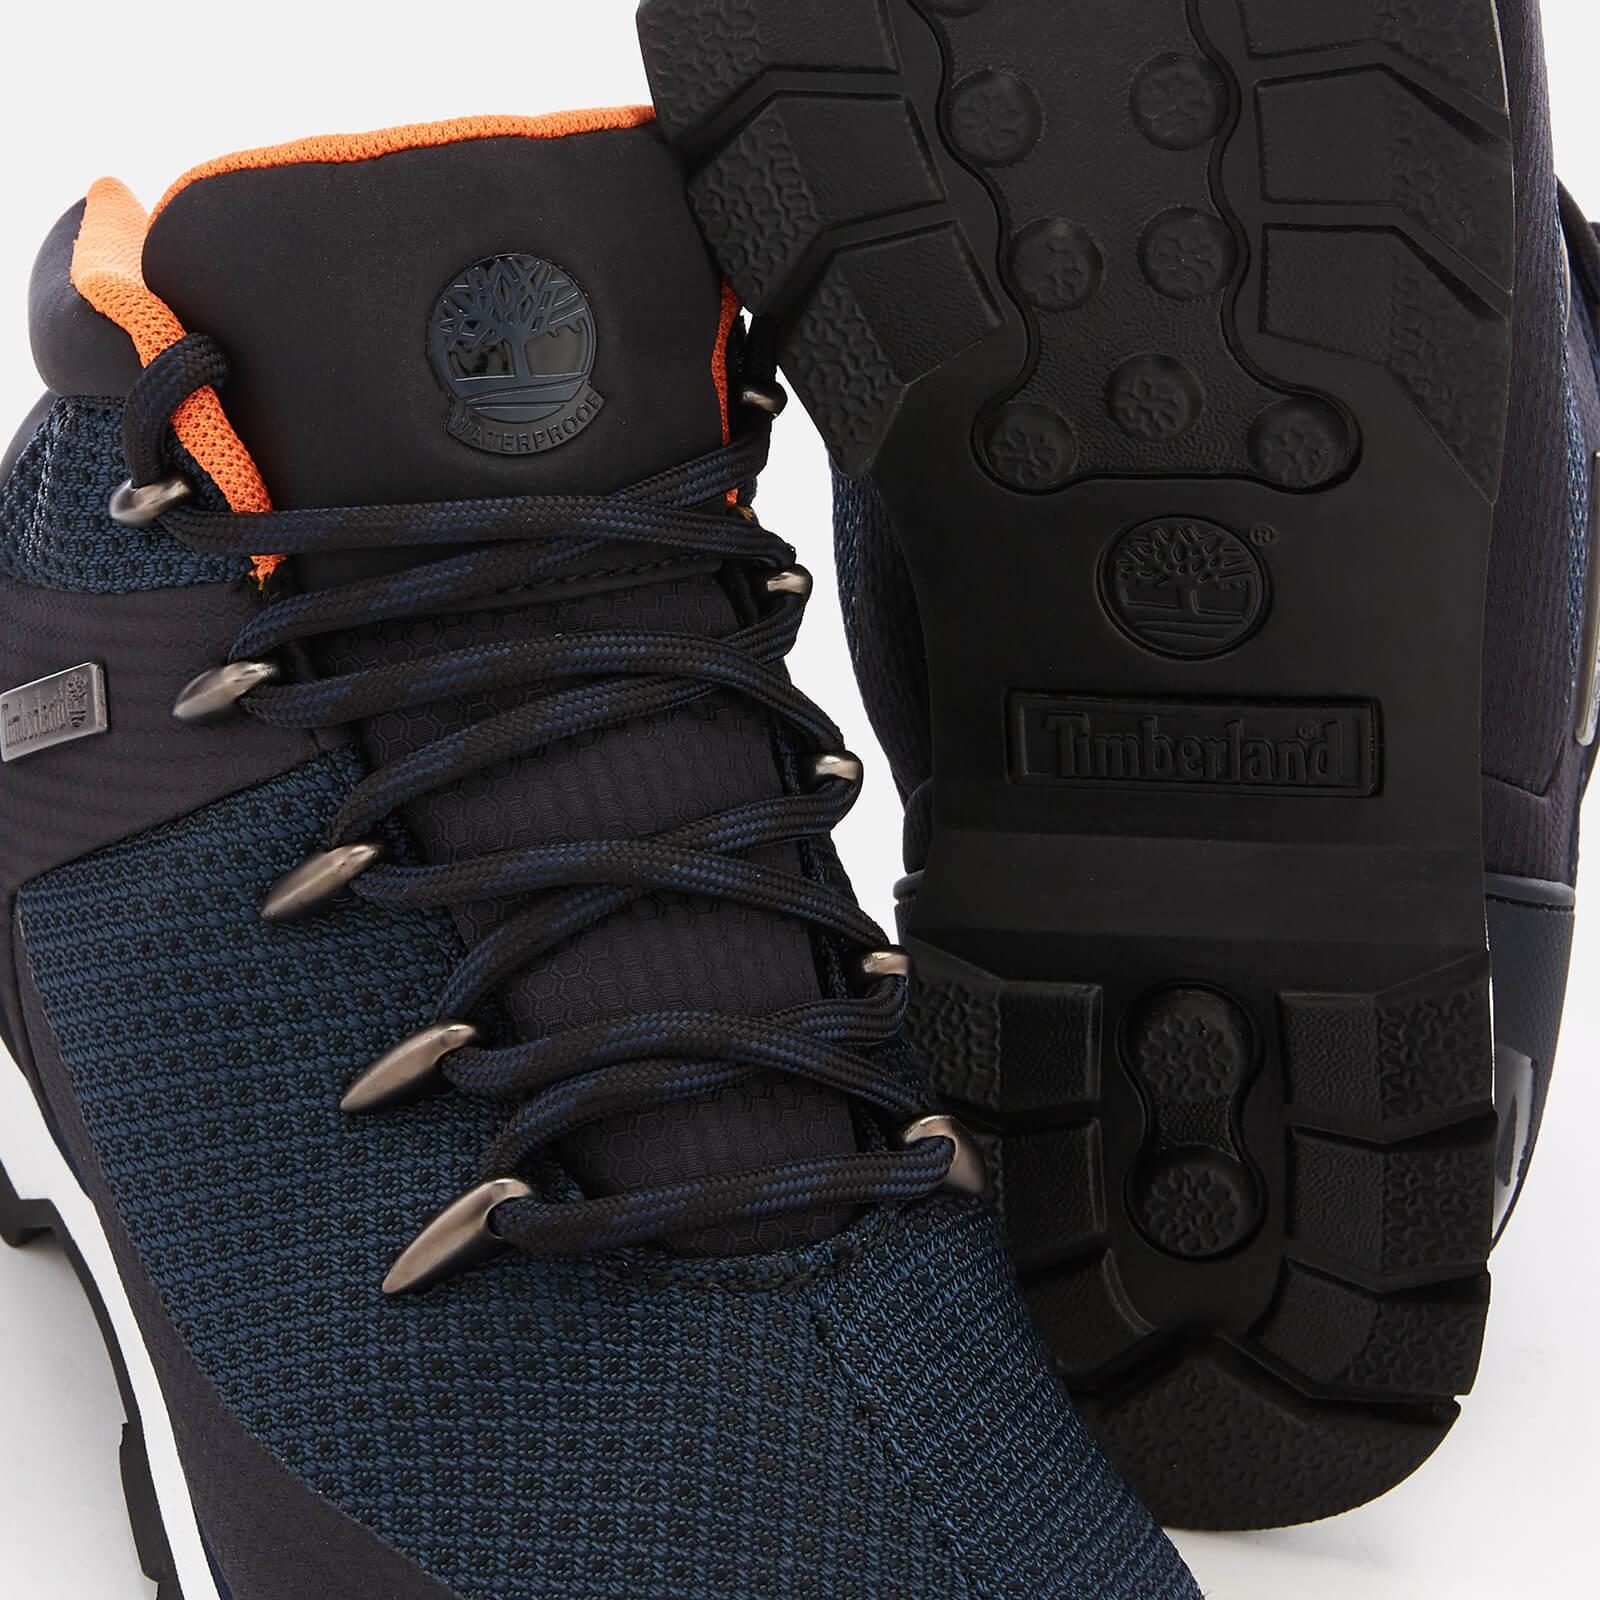 Euro Sprint Waterproof Hiker Style Boots